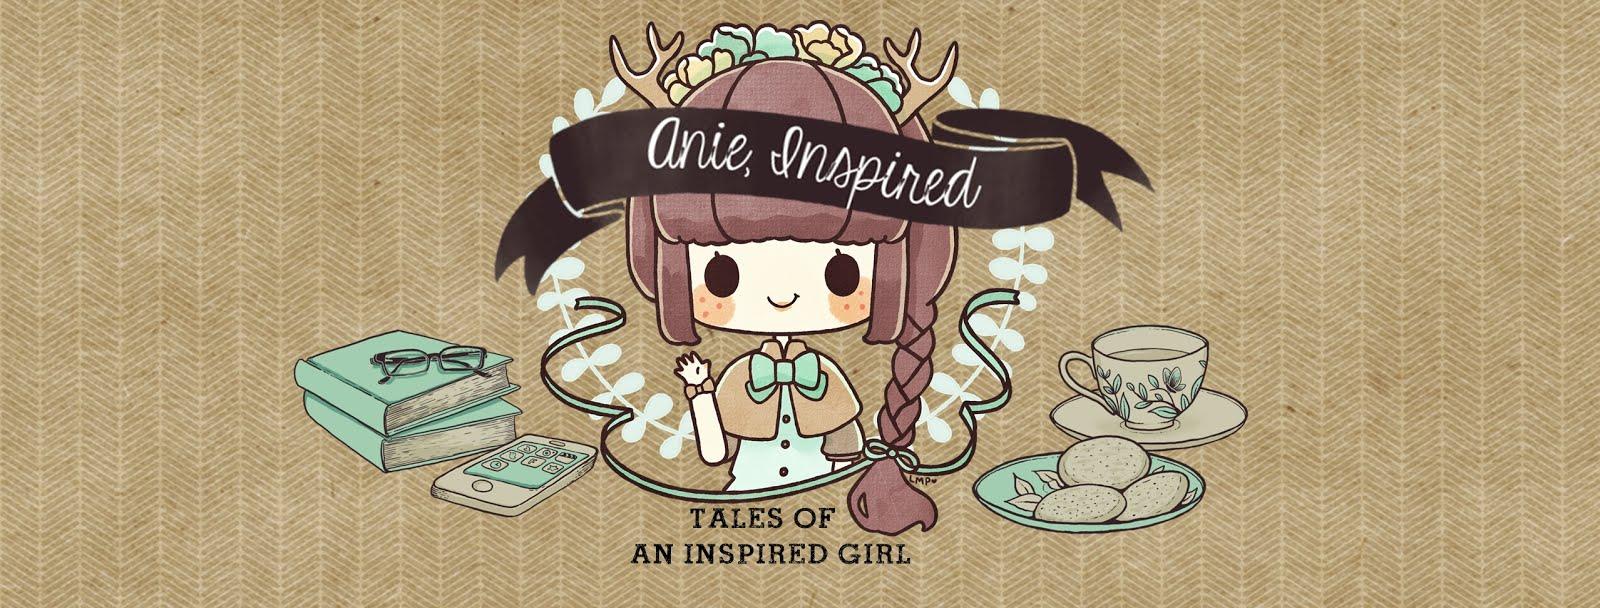 Anie, Inspired